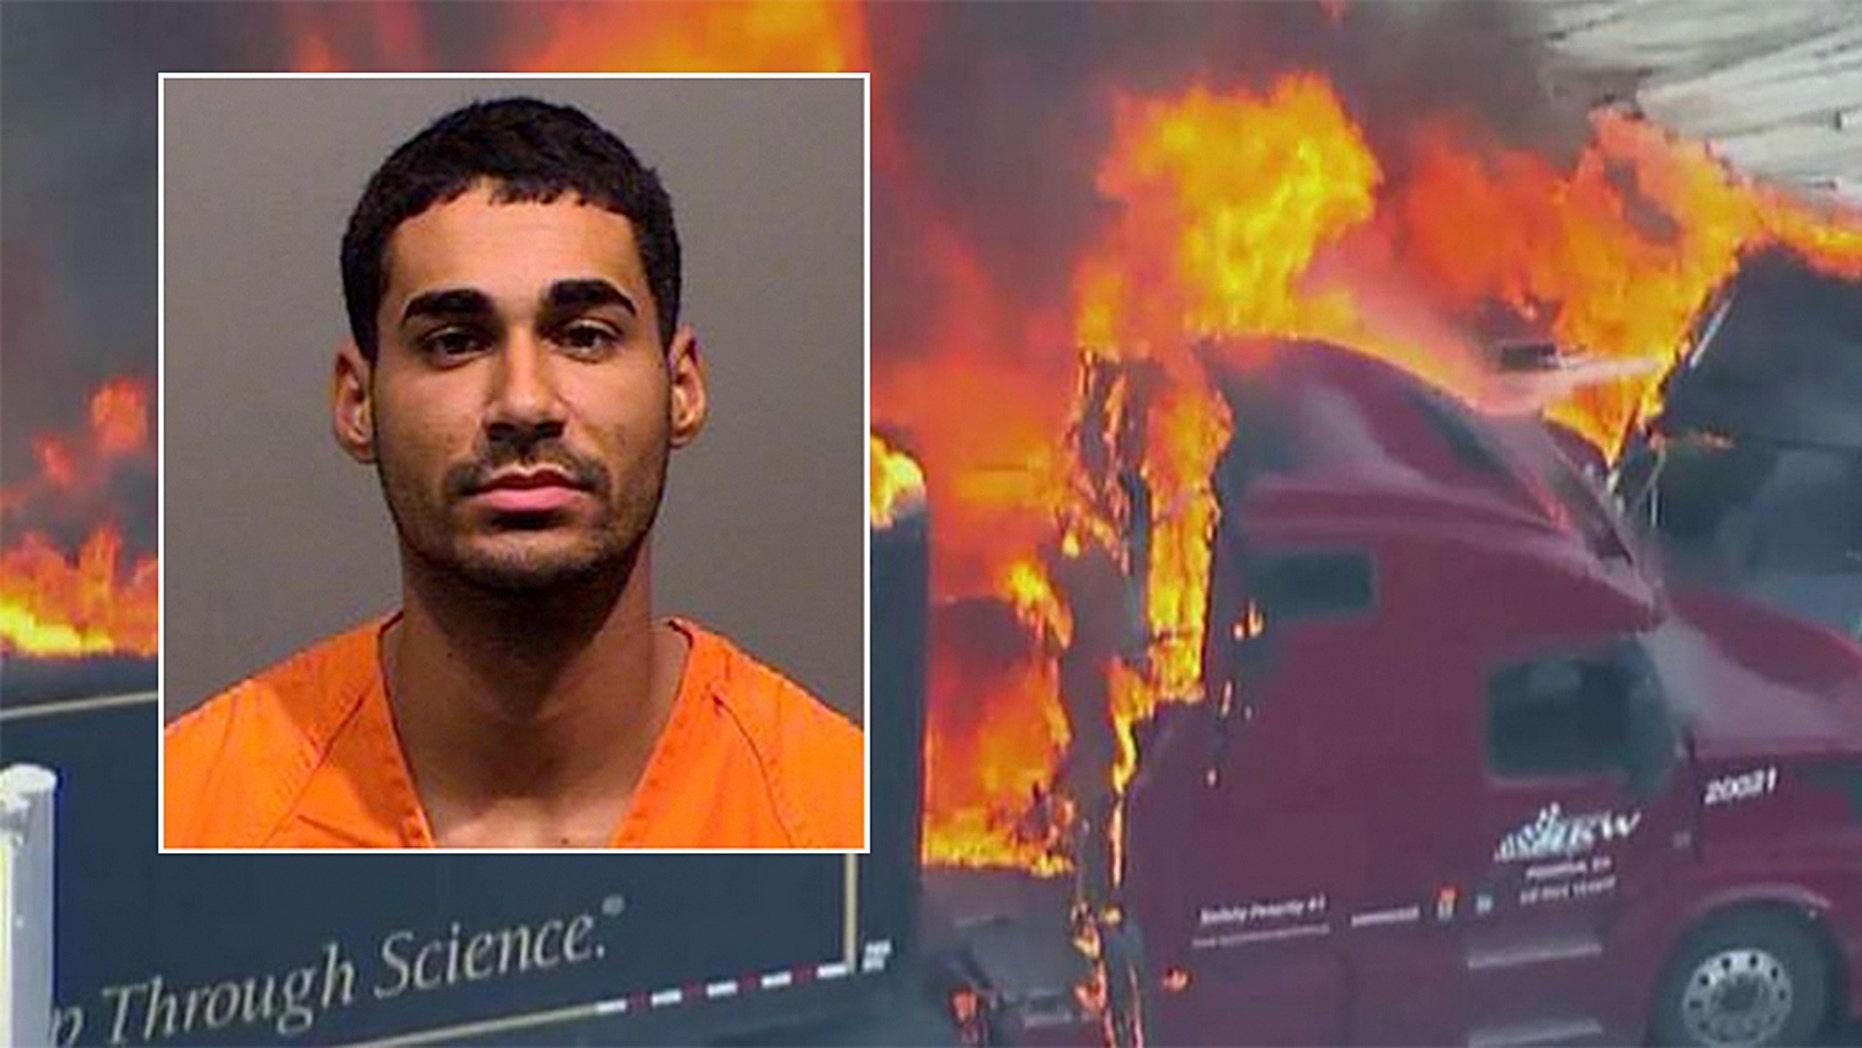 Truck driver, 23, gets bond set at $400G in fatal 28-car